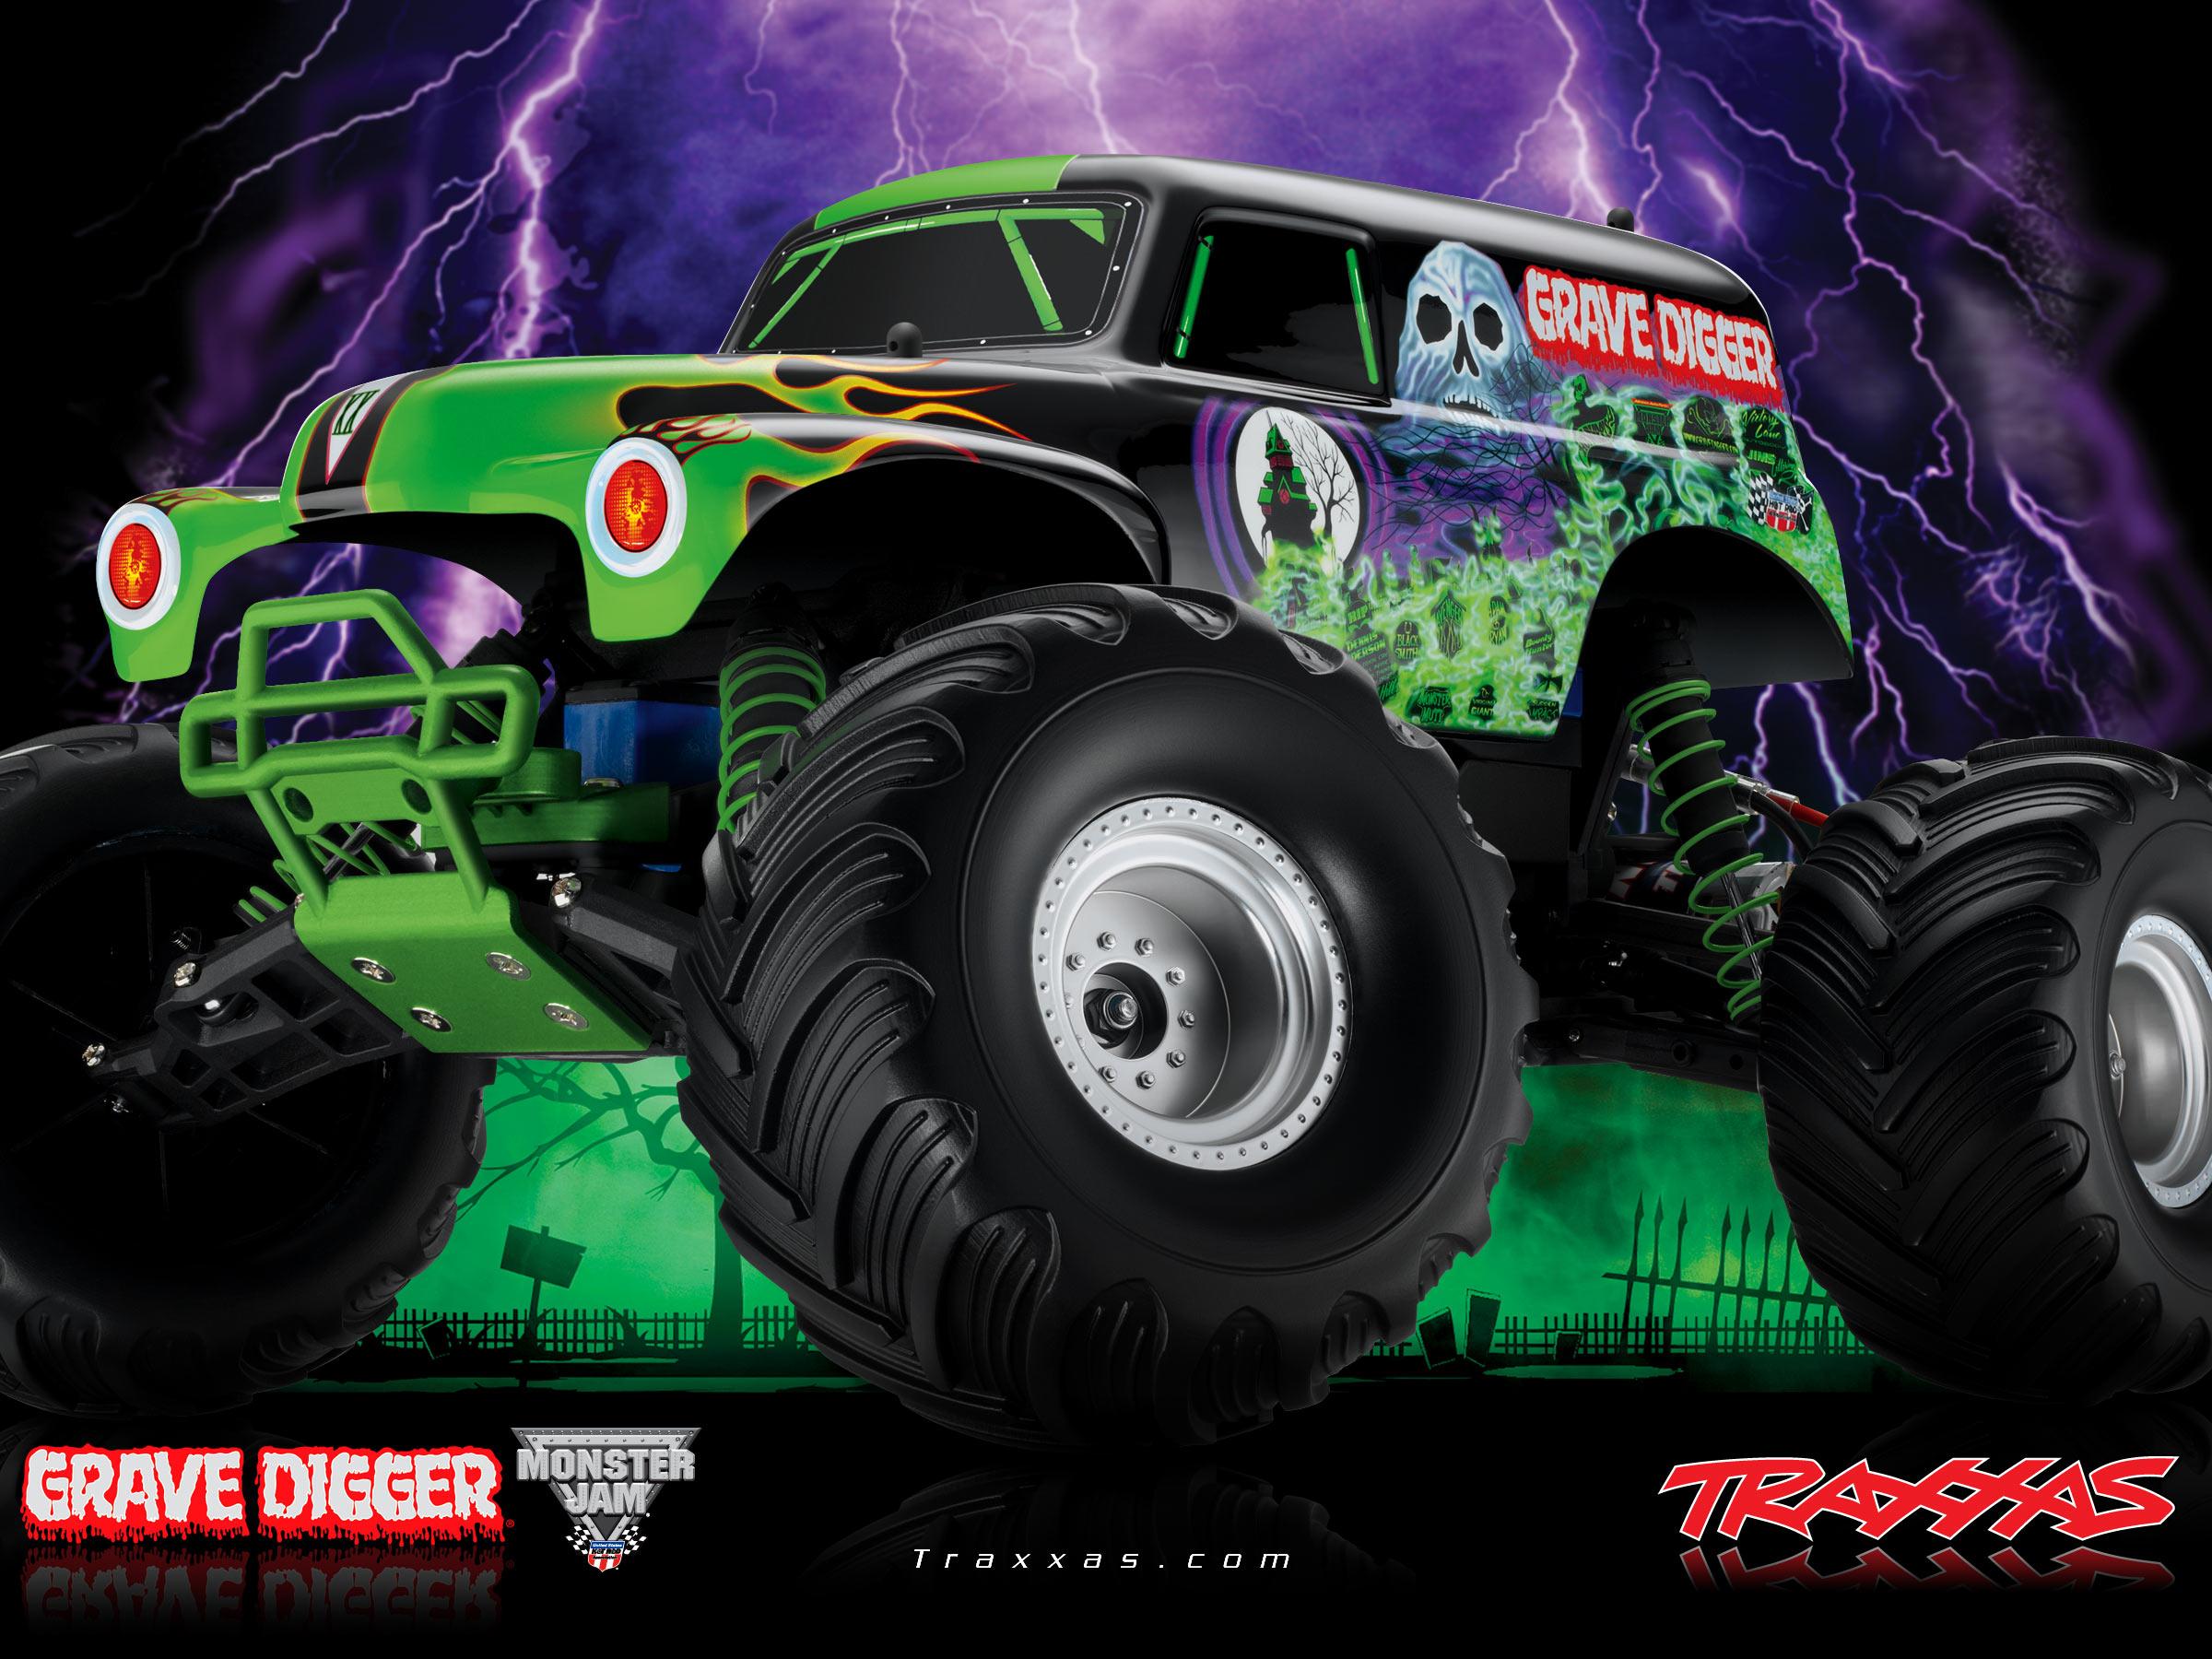 Grave Digger Monster Truck Wallpaper on